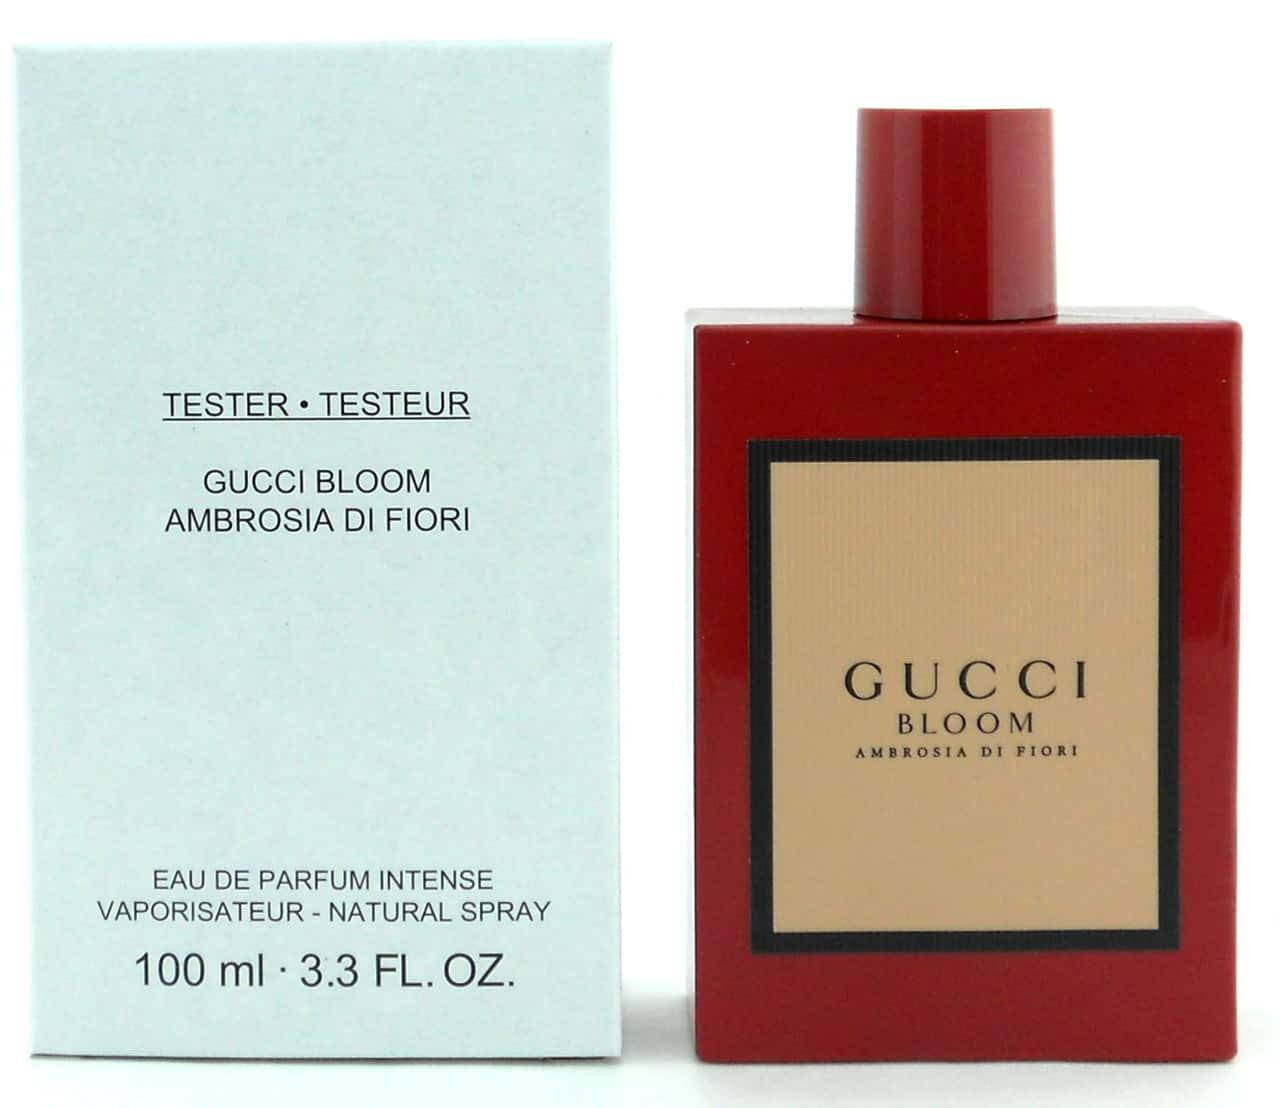 عطر Bloom Ambrosia di Fiori Eau de Parfum Intense من ماركة غوتشي Gucci